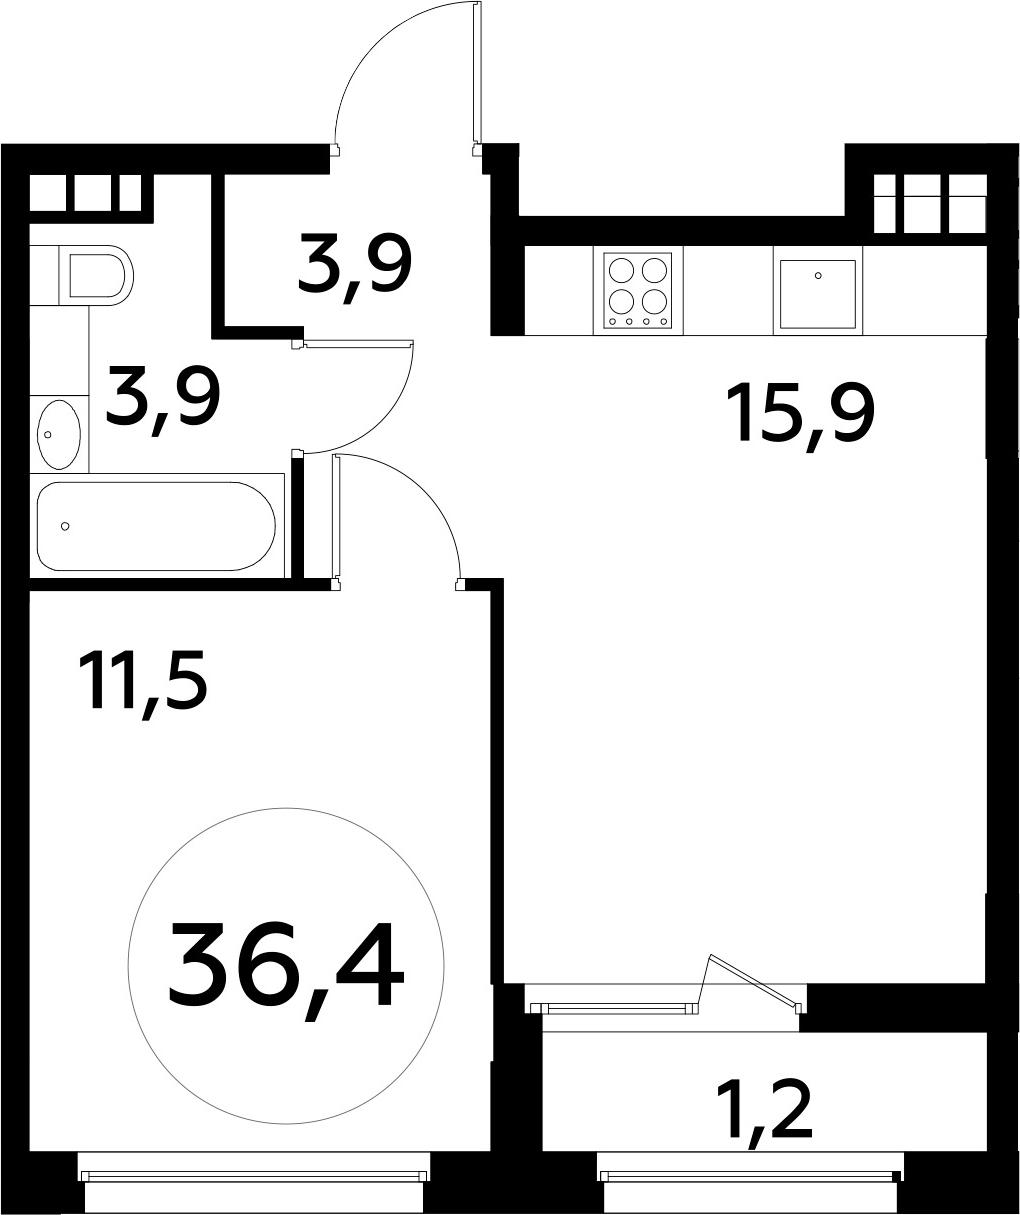 2Е-к.кв, 36.4 м²